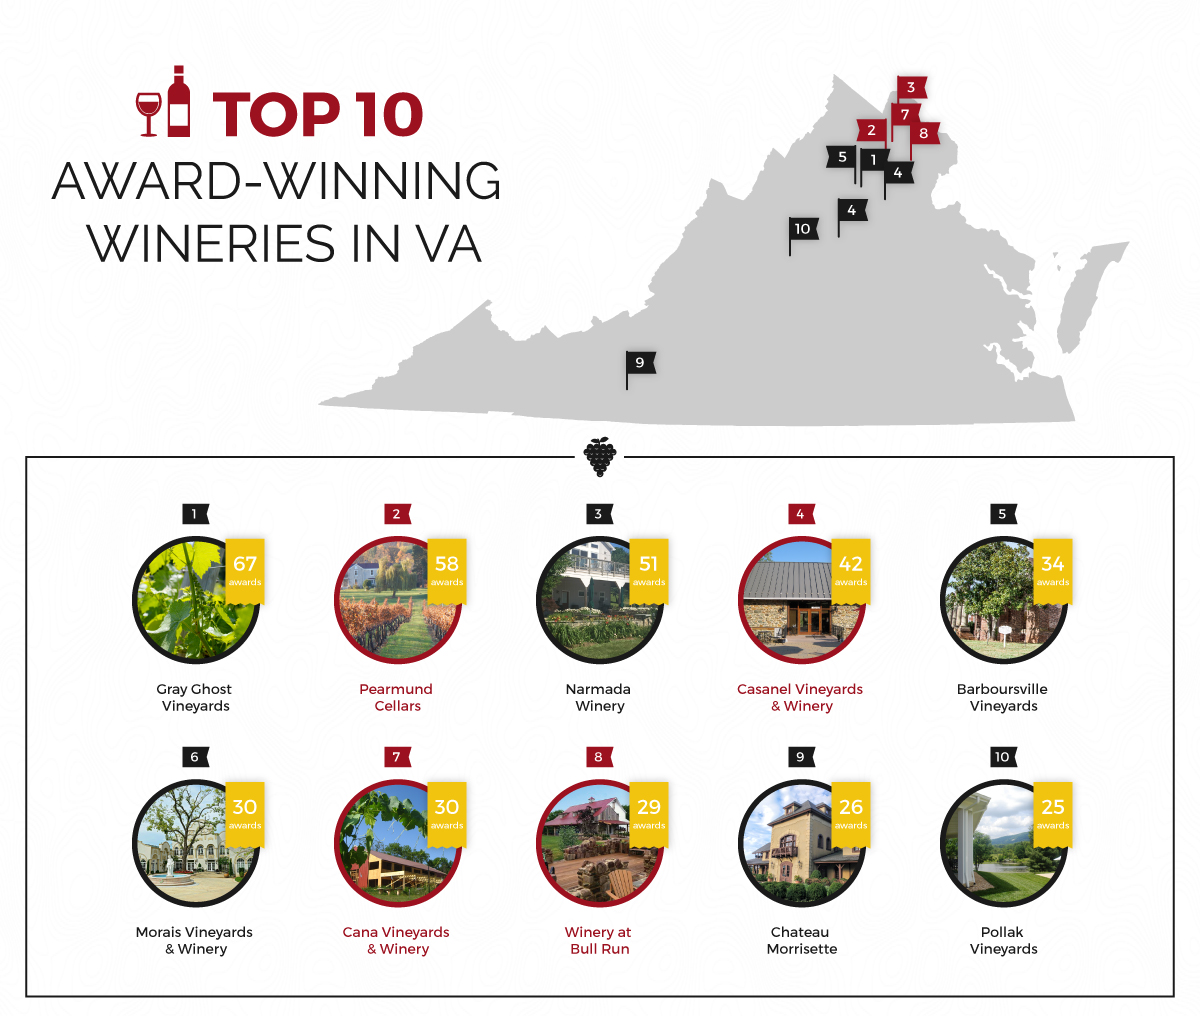 Best vineyards in Virginia